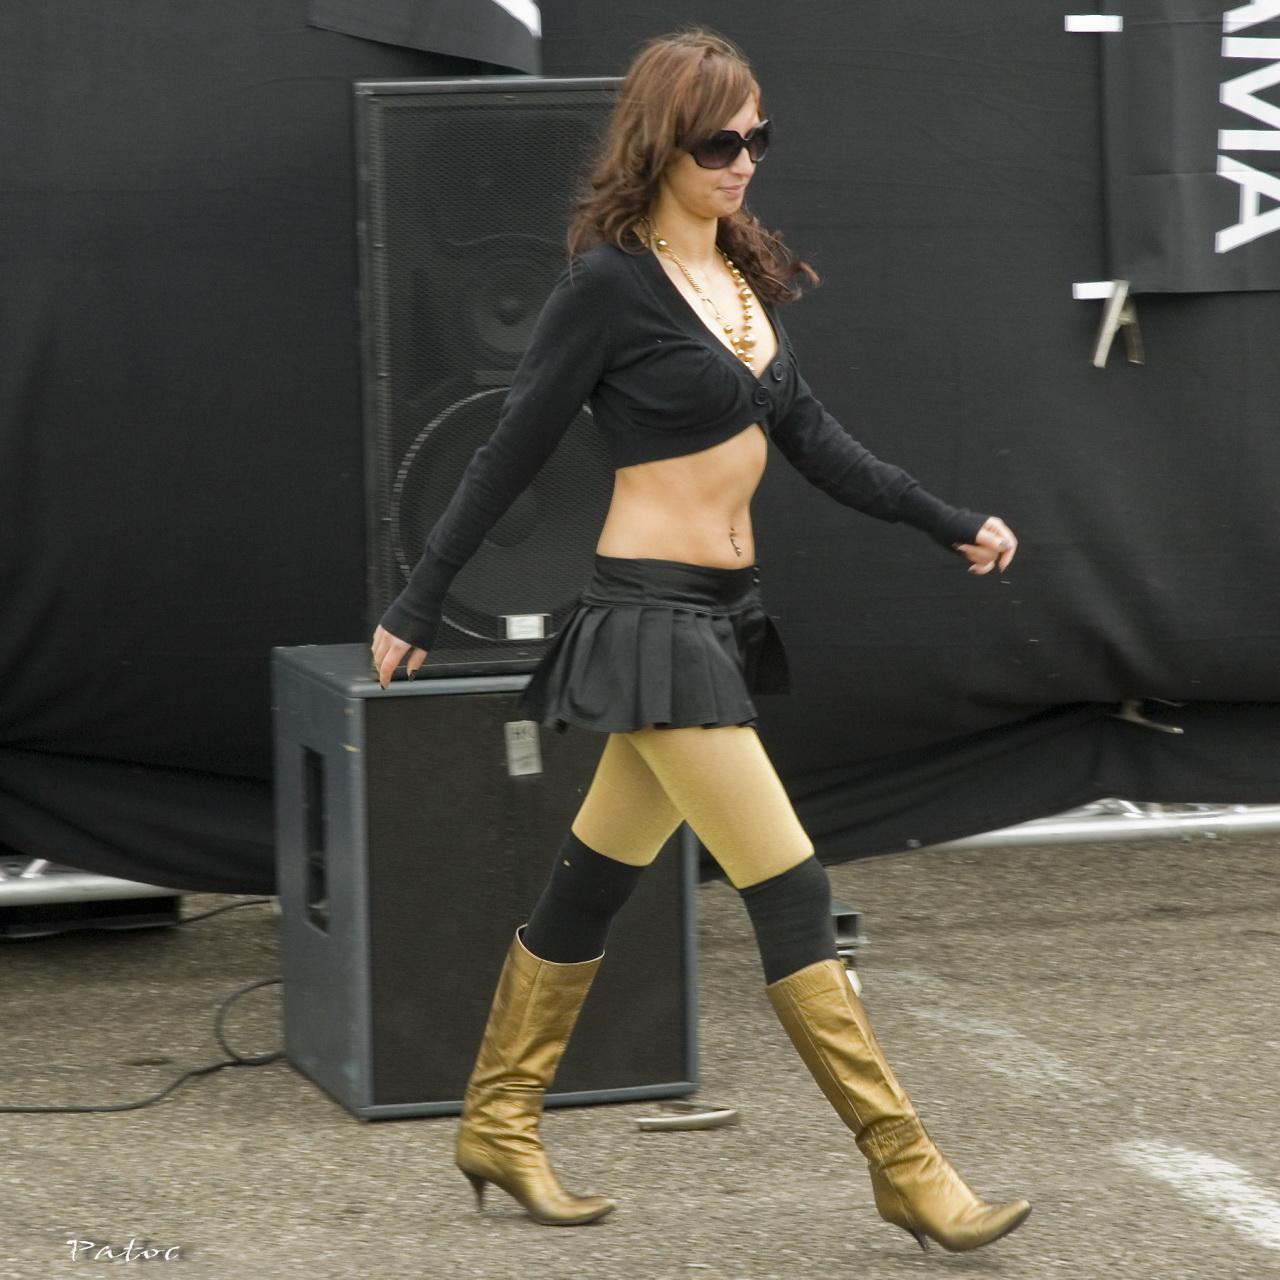 Tuning girl in black 2